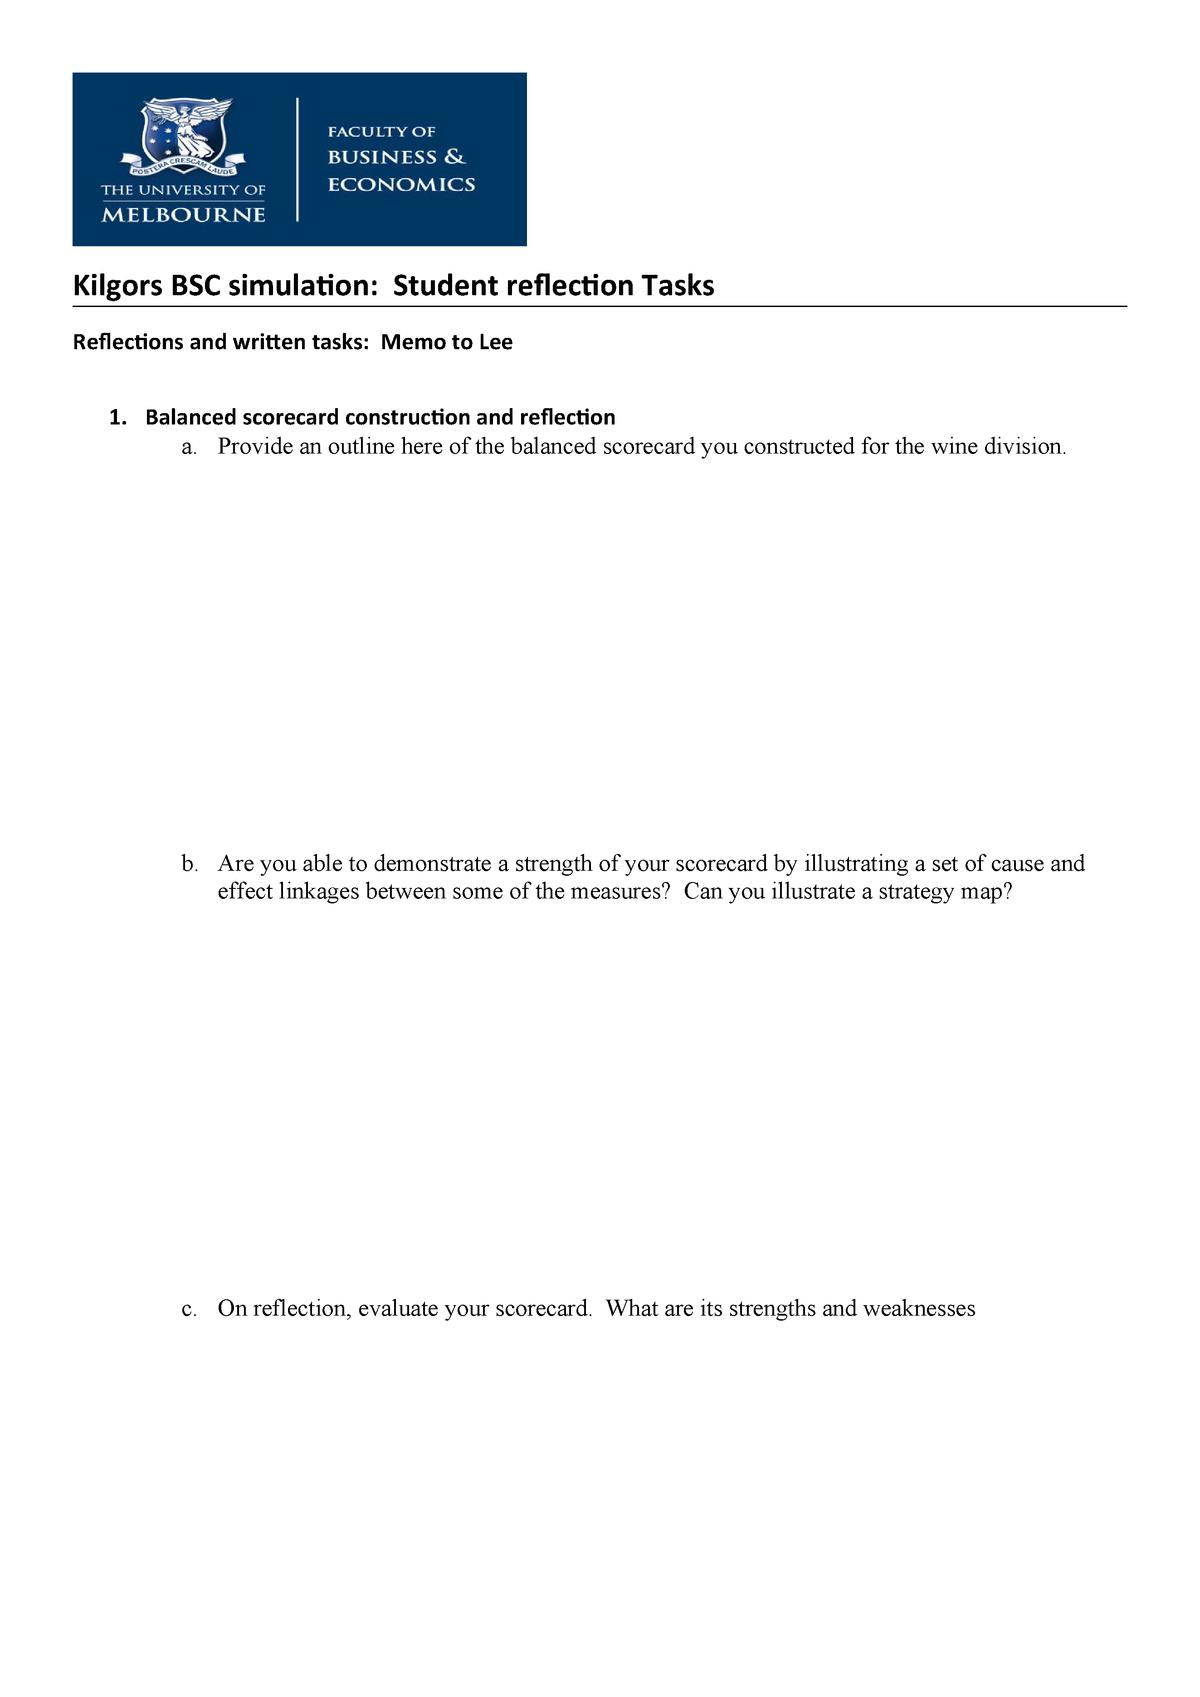 Kilgors BSC simulation student reflection tasks - ACCT30002